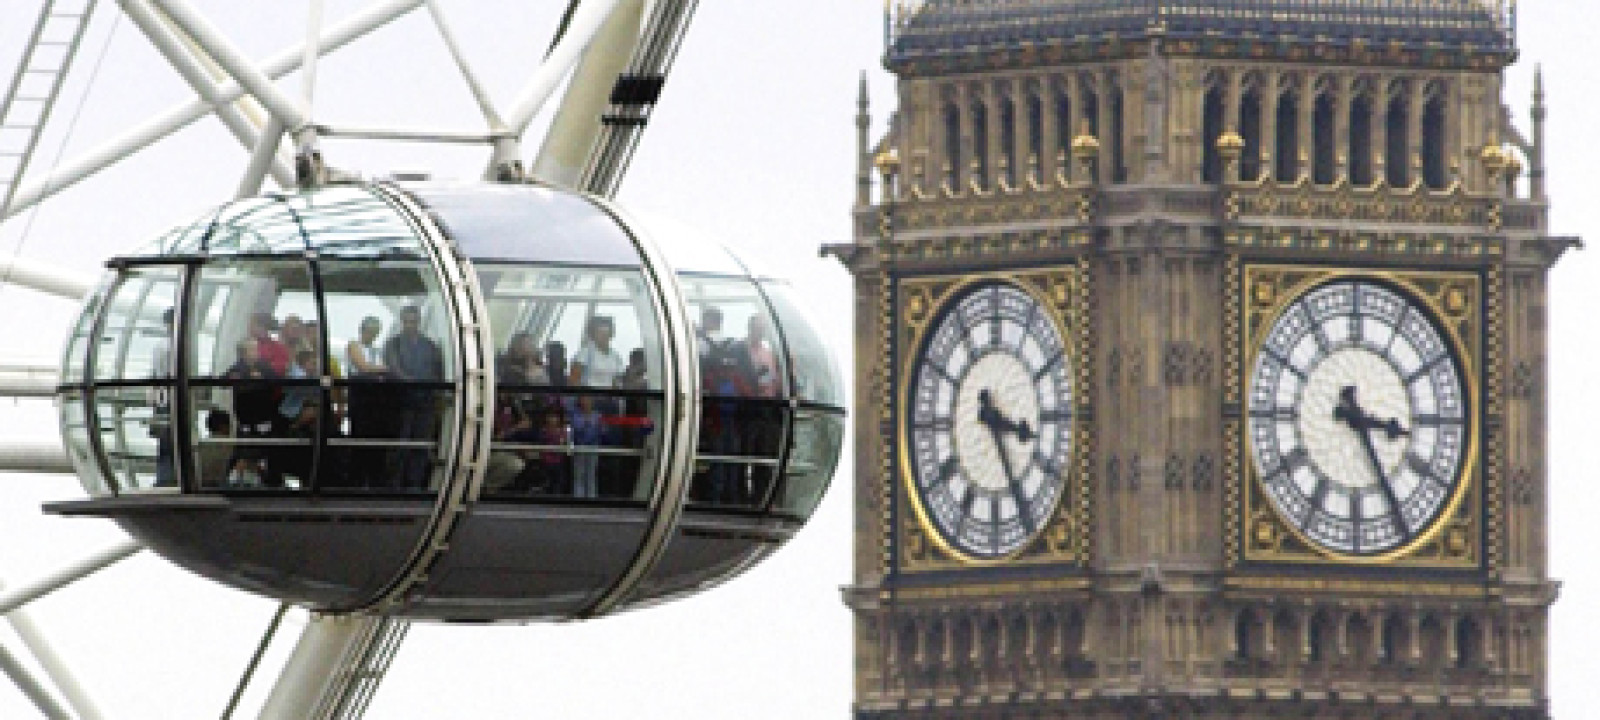 BRITAIN LONDON EYE